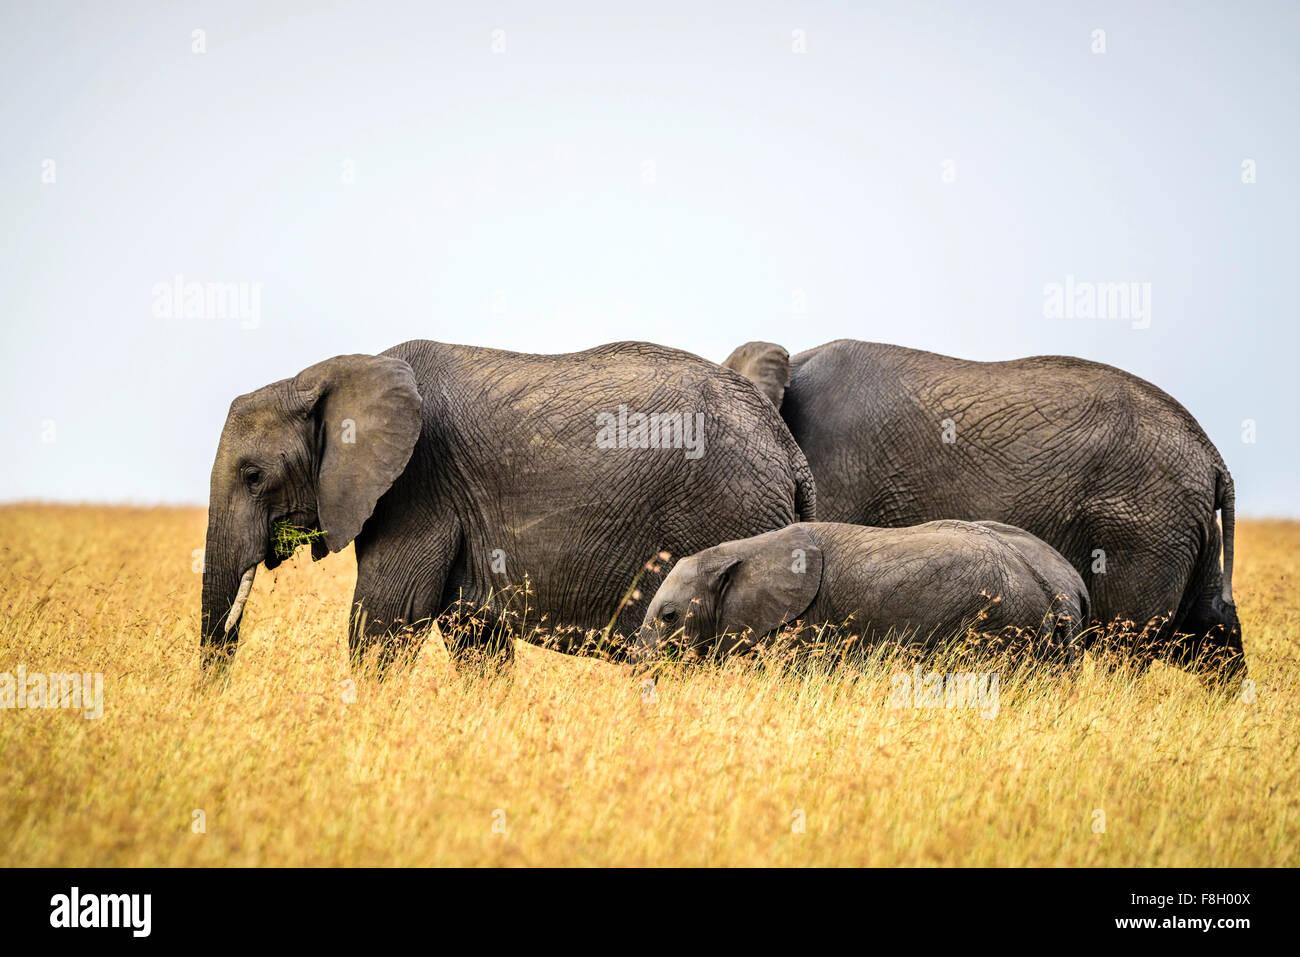 Elephants and calf walking in savanna - Stock Image